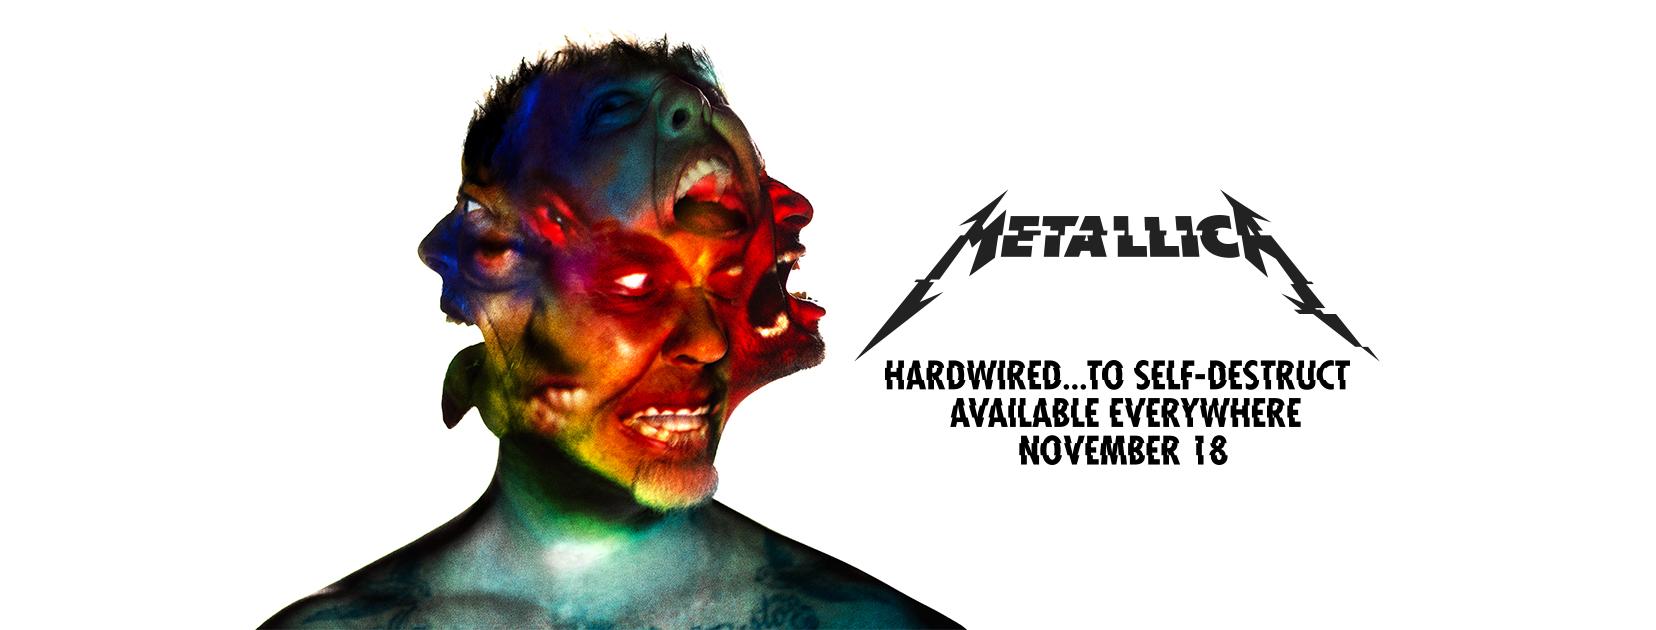 Metallica Hardwired